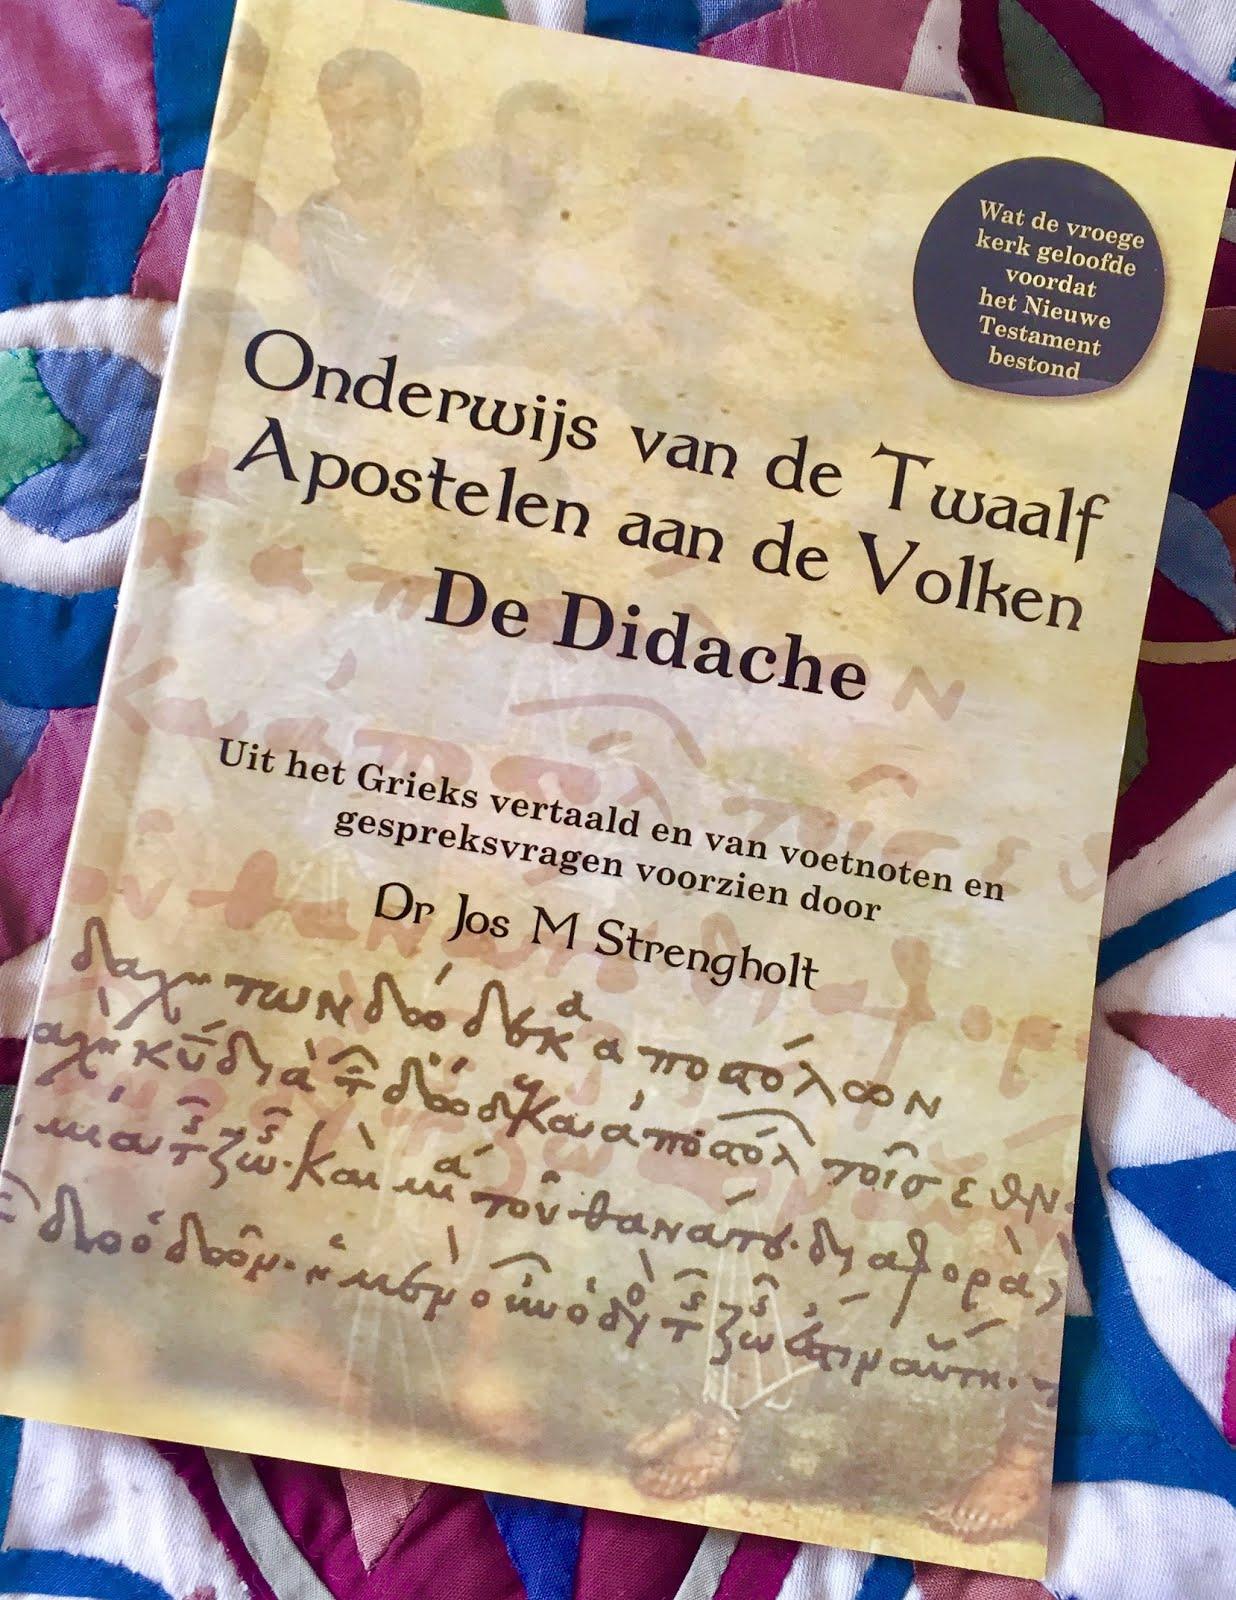 De Didache: 7.95 euro incl verzenden